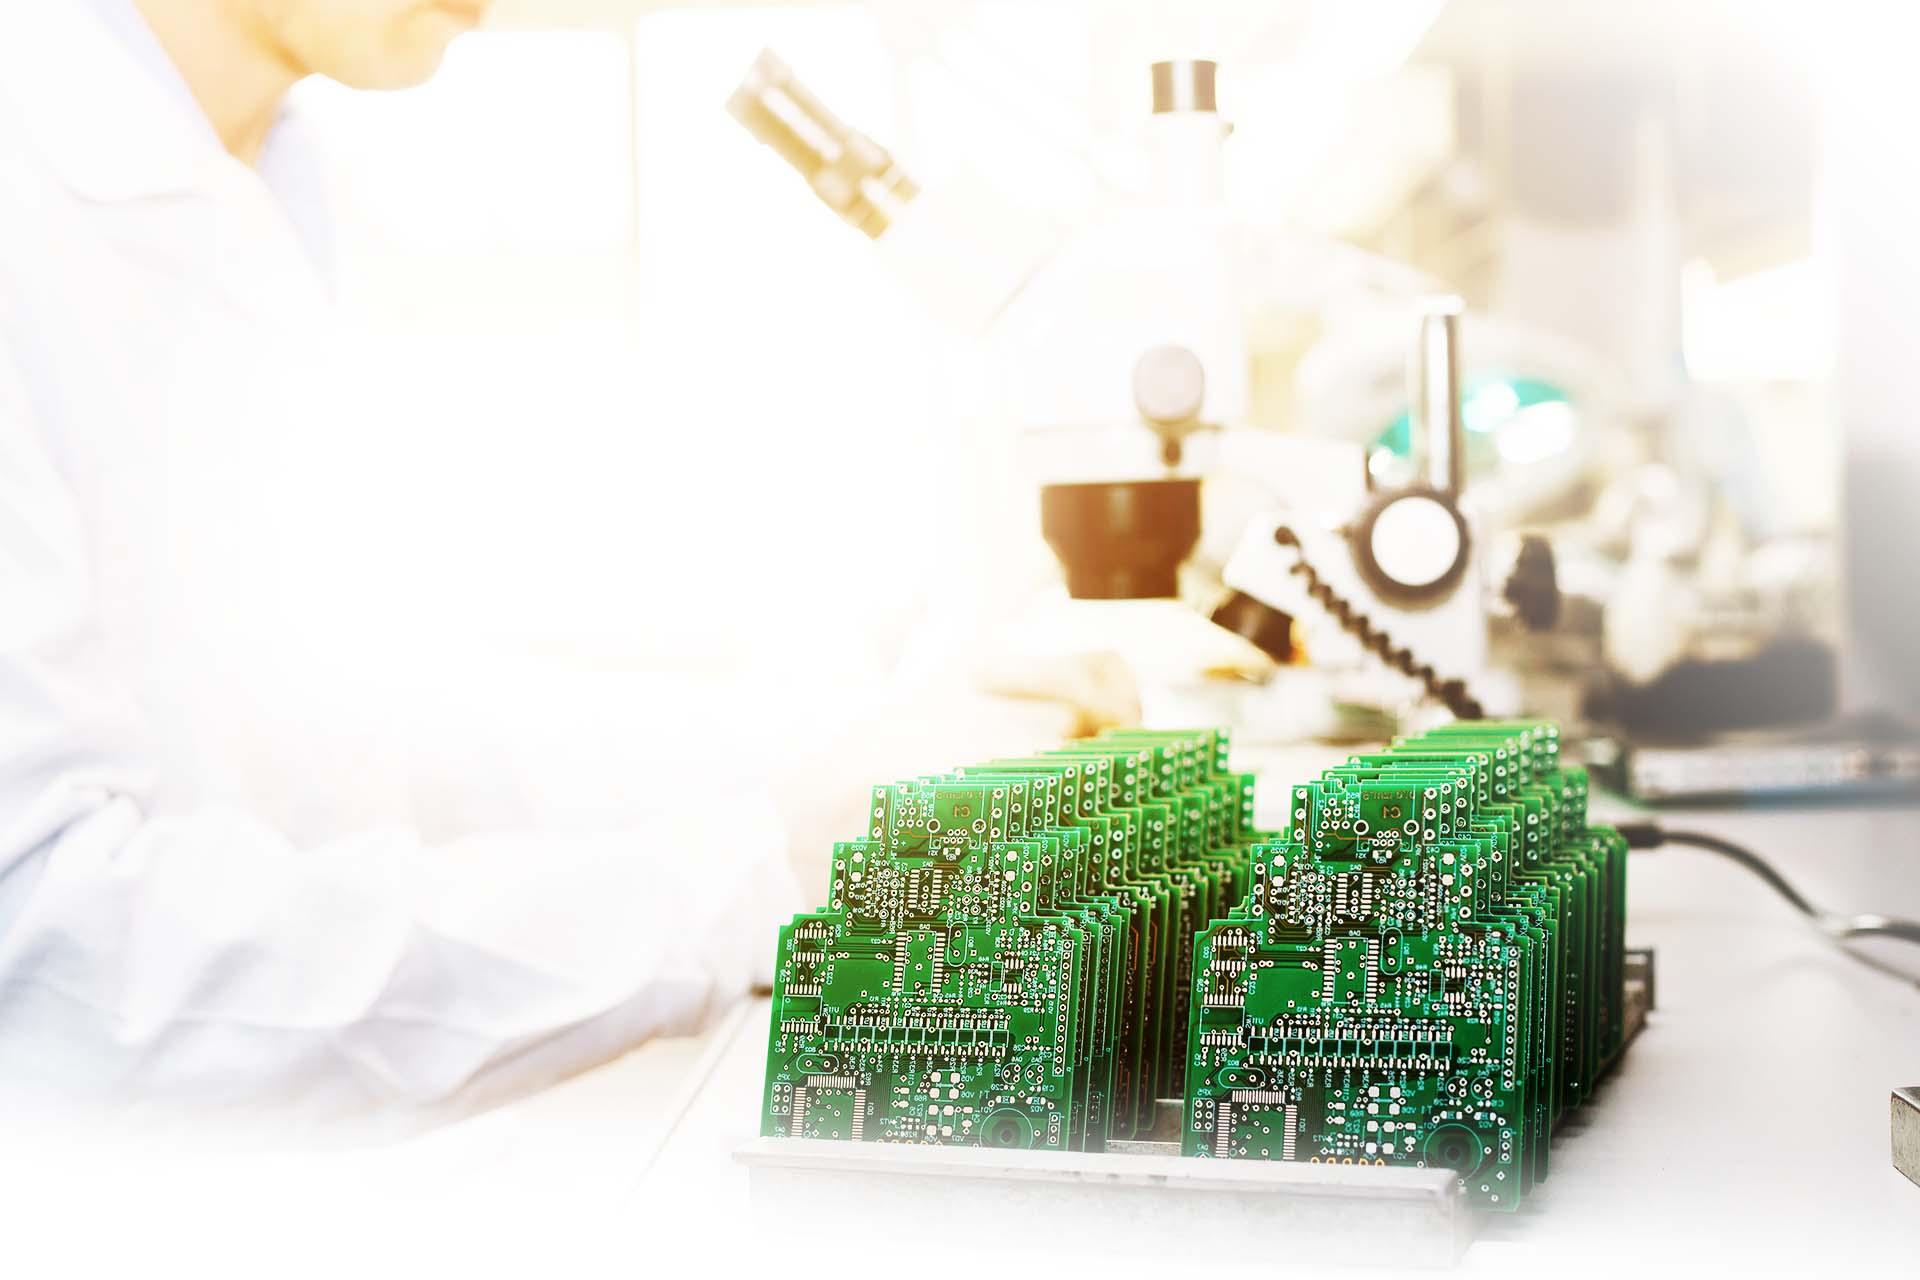 Electronics Manufacturer In The Uk Bpc Ltd Printed Circuit Board Repairs Any General Industrial Pcb Design